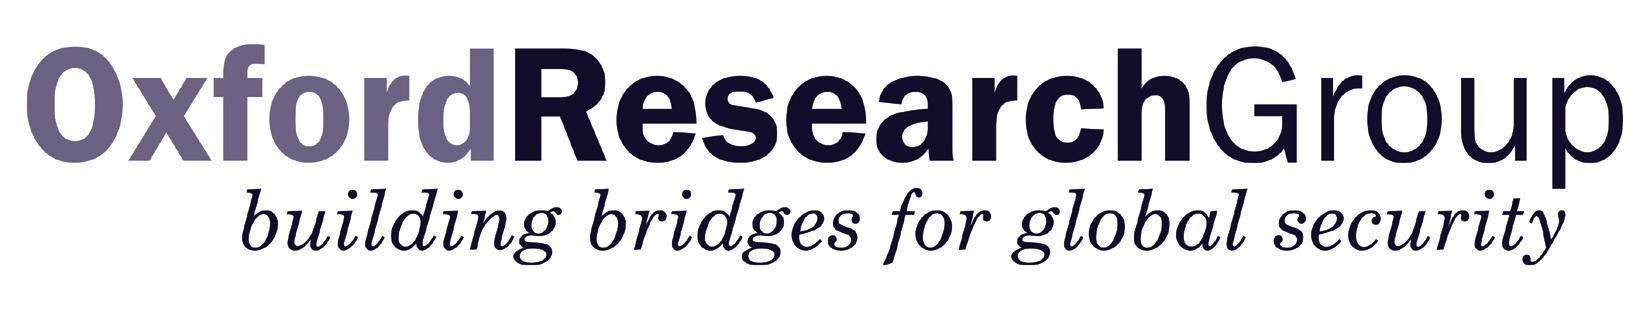 Oxford-Research-Group_Logo_1650x309.jpg